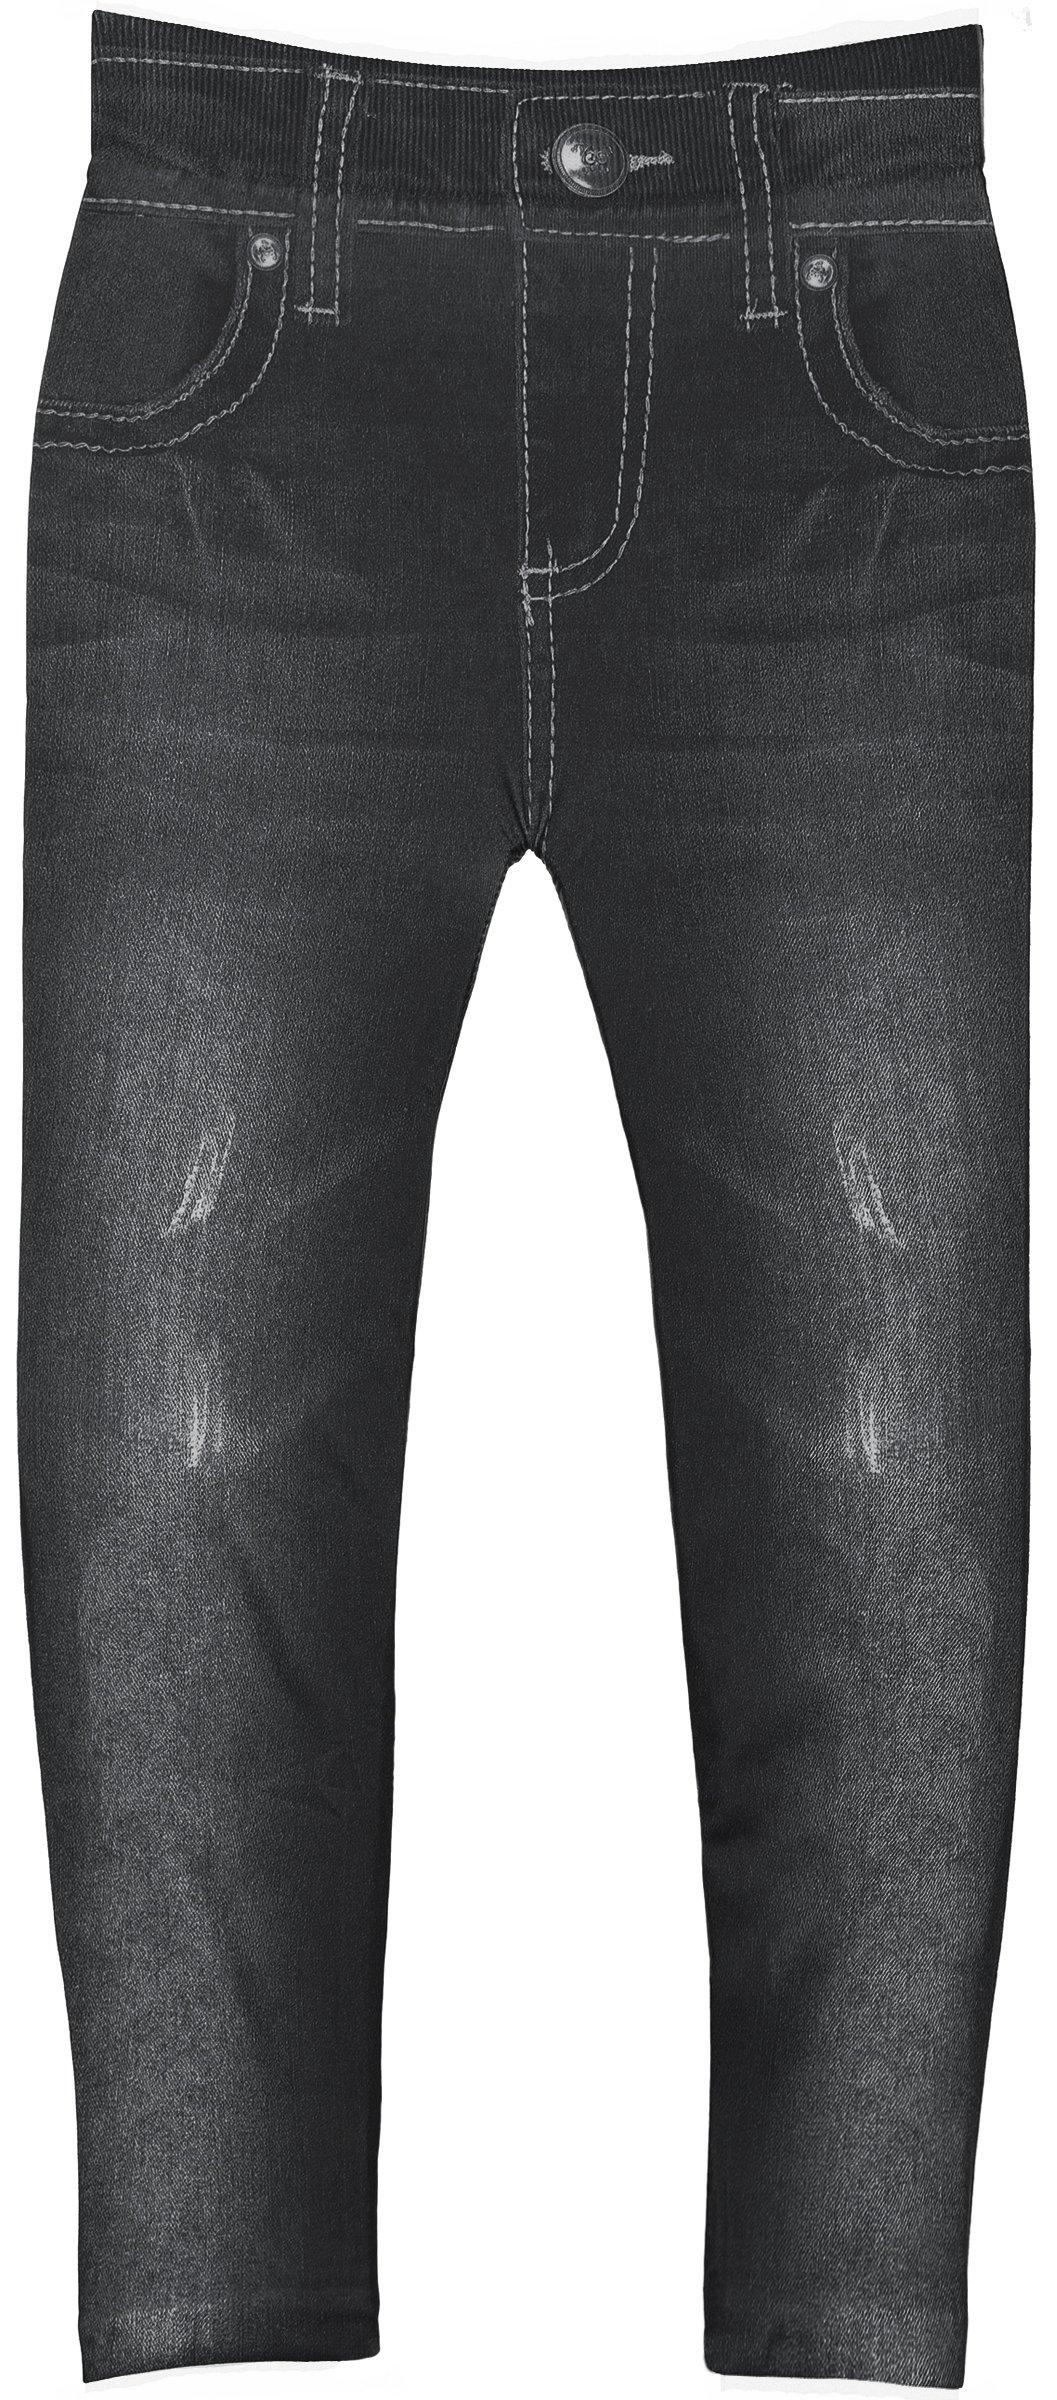 Crush Toddler Girls Blue Jean Print Leggings in 7 Fun Styles in Sizes 2T-4T (2T-4T, 22492 Black)